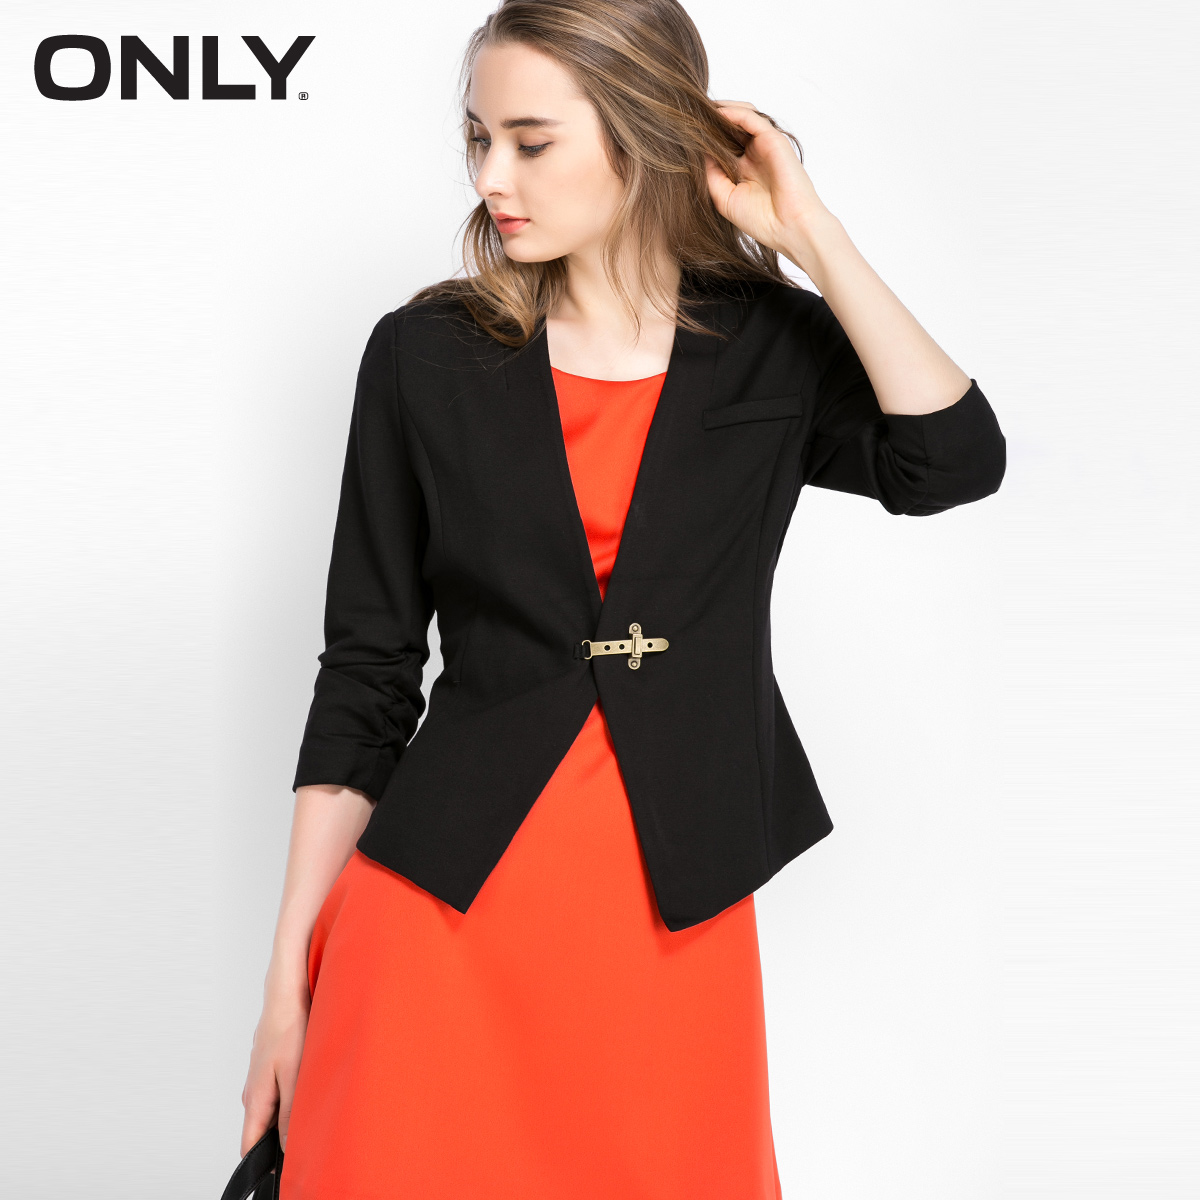 ONLY小西装女外套怎么样,质量好吗